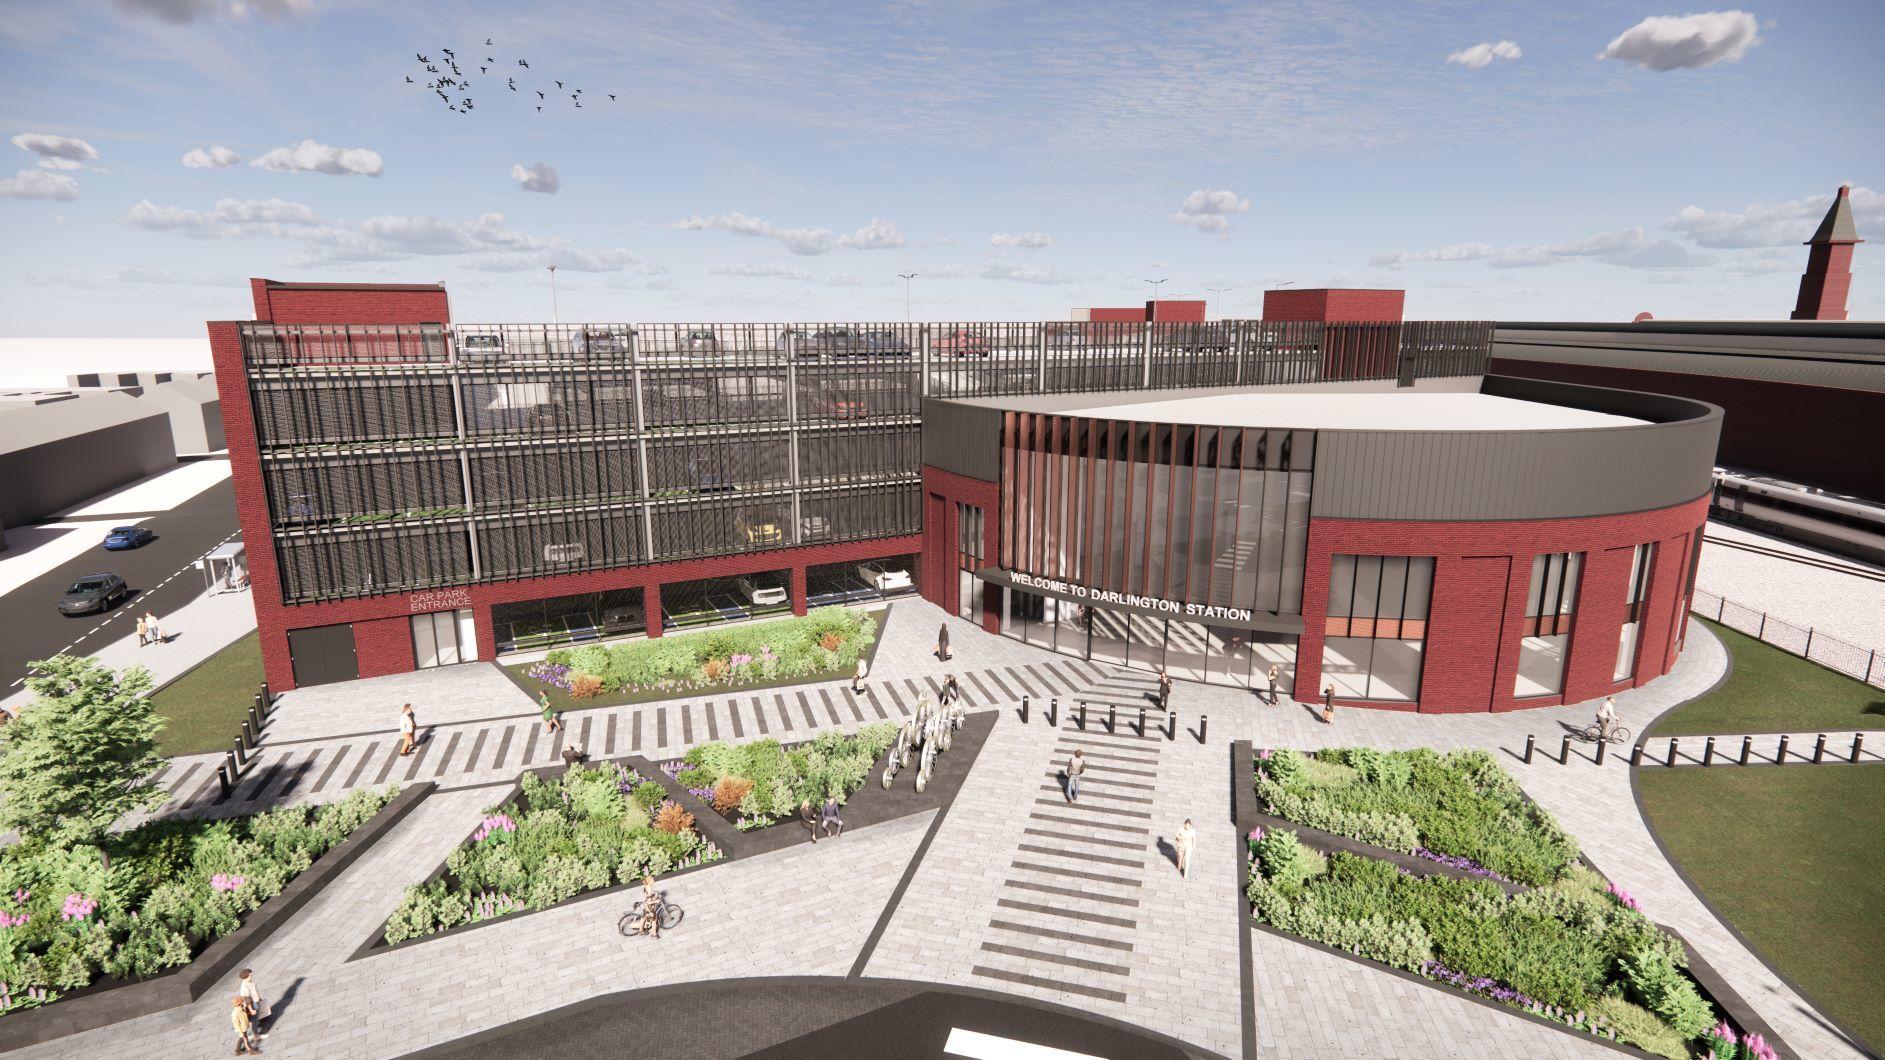 Consultation underway on £100m redevelopment of Darlington Station